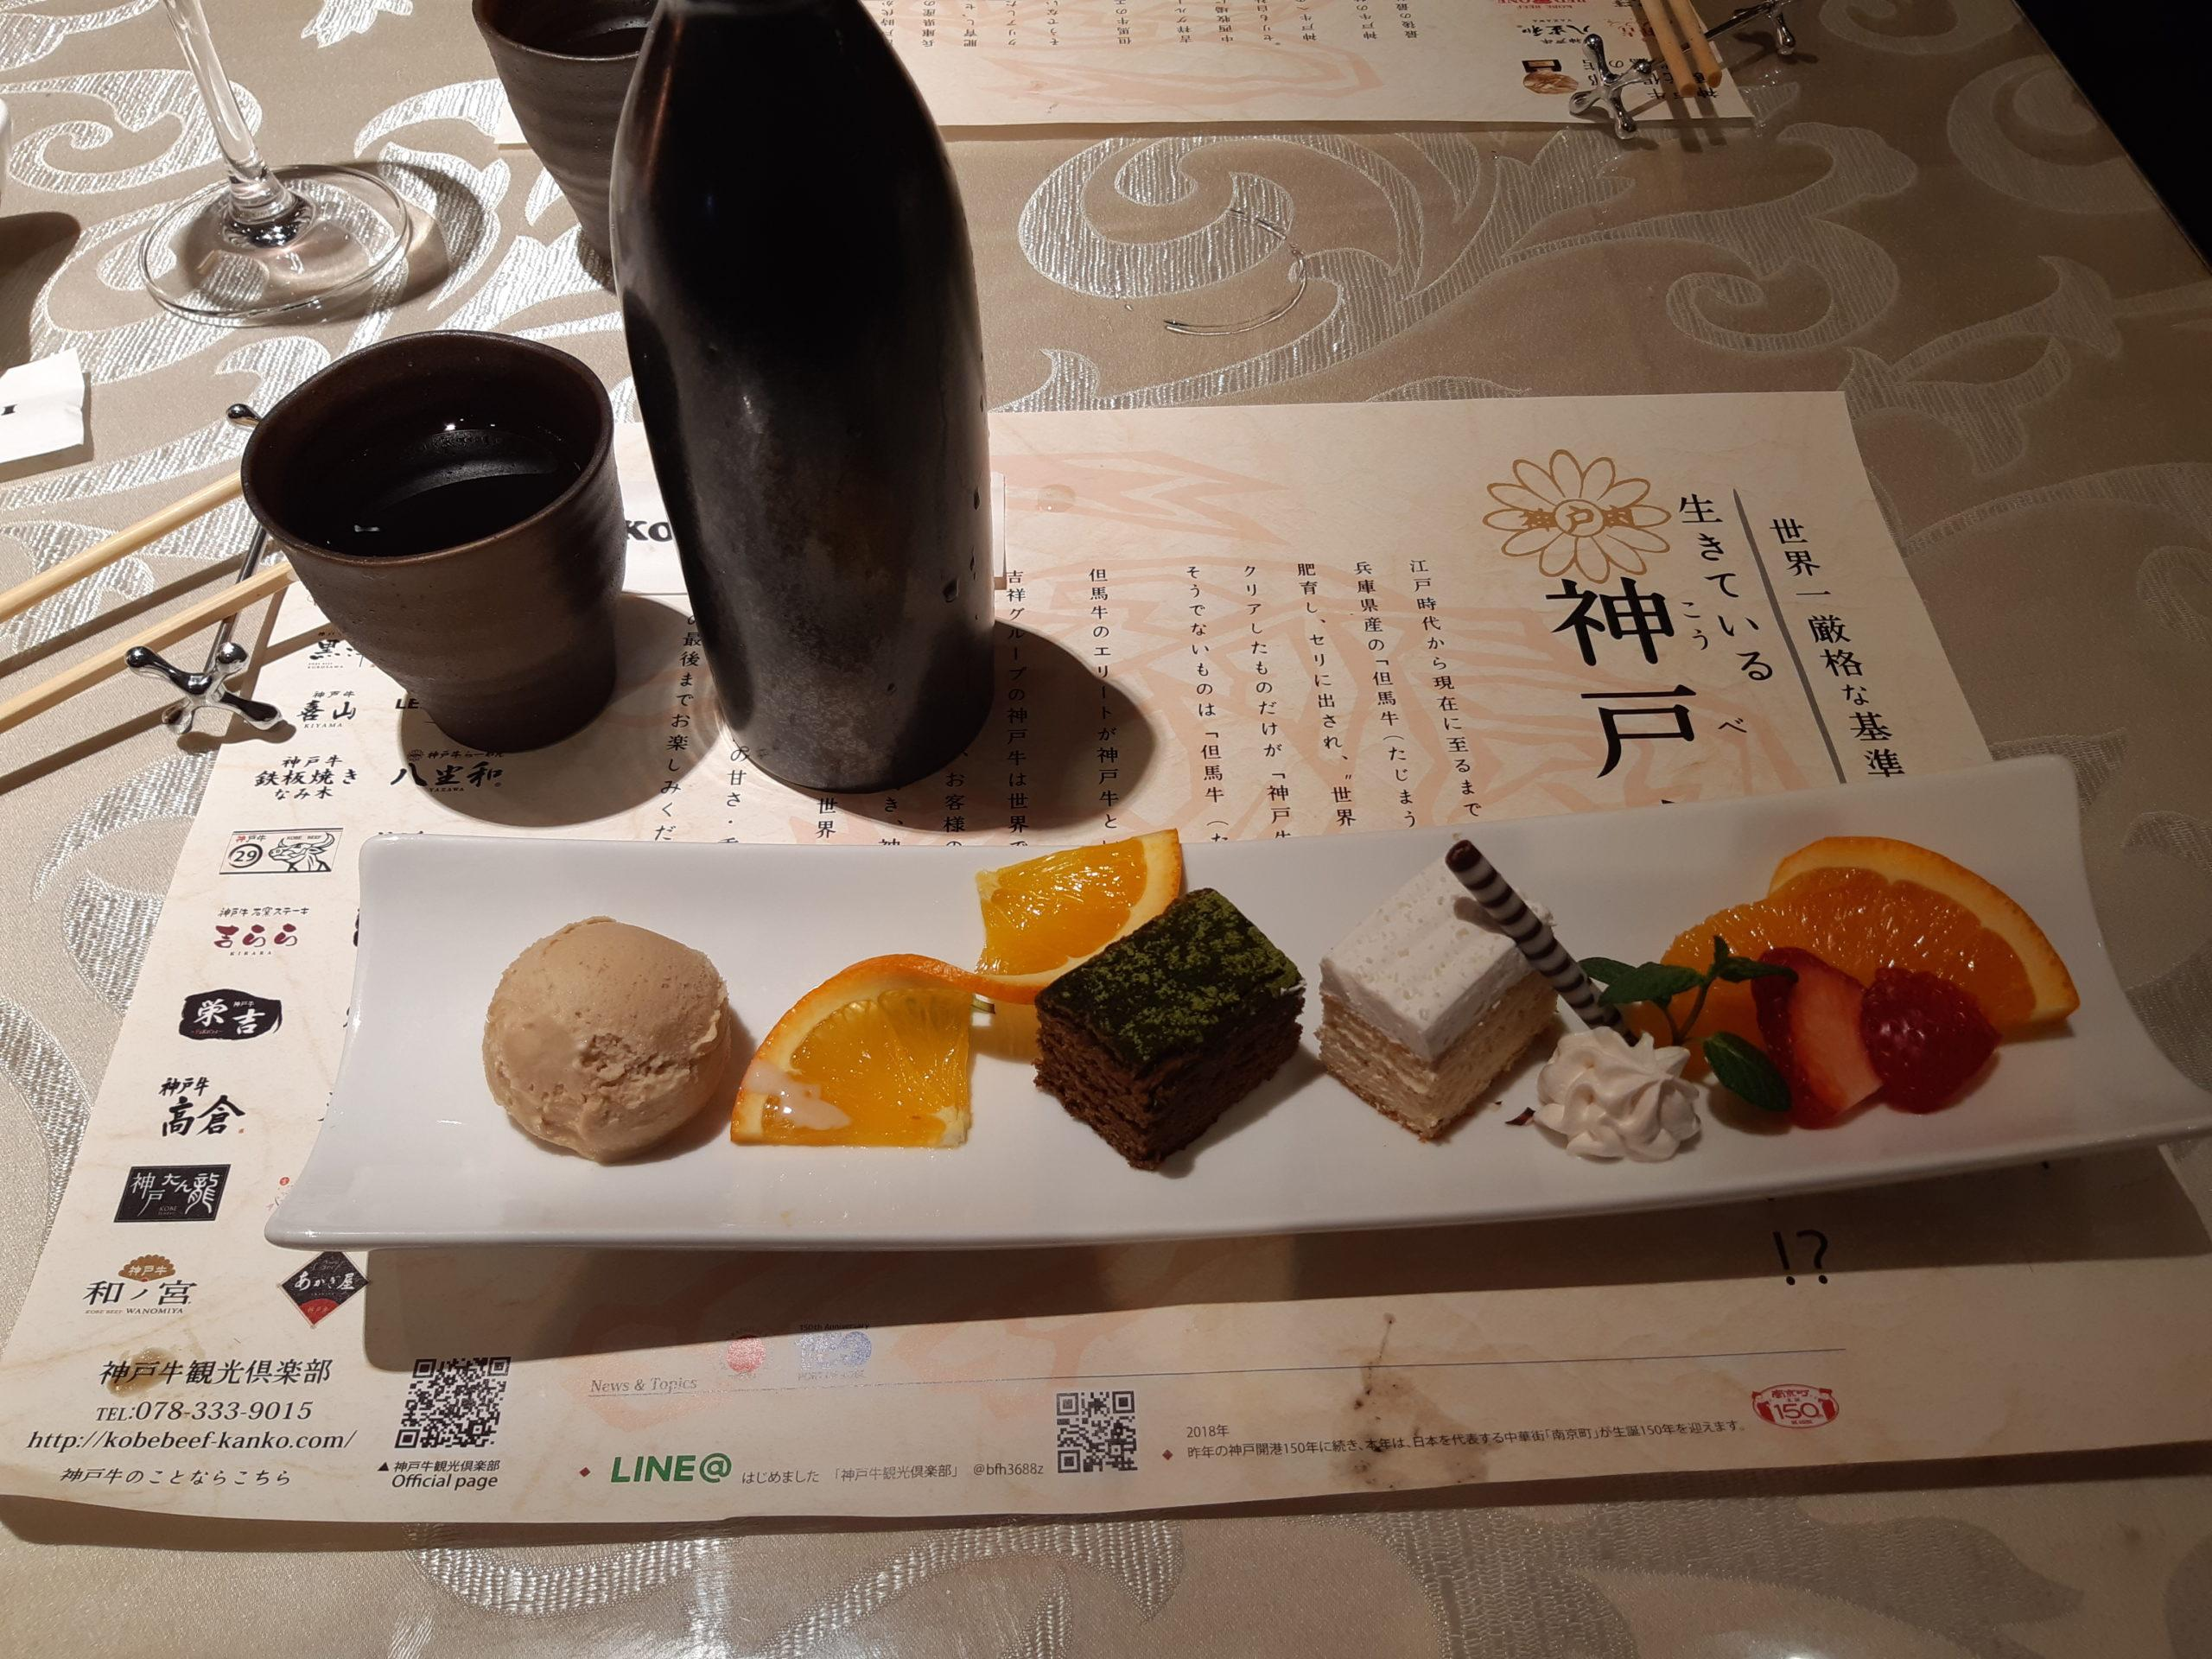 Dessert Kobe